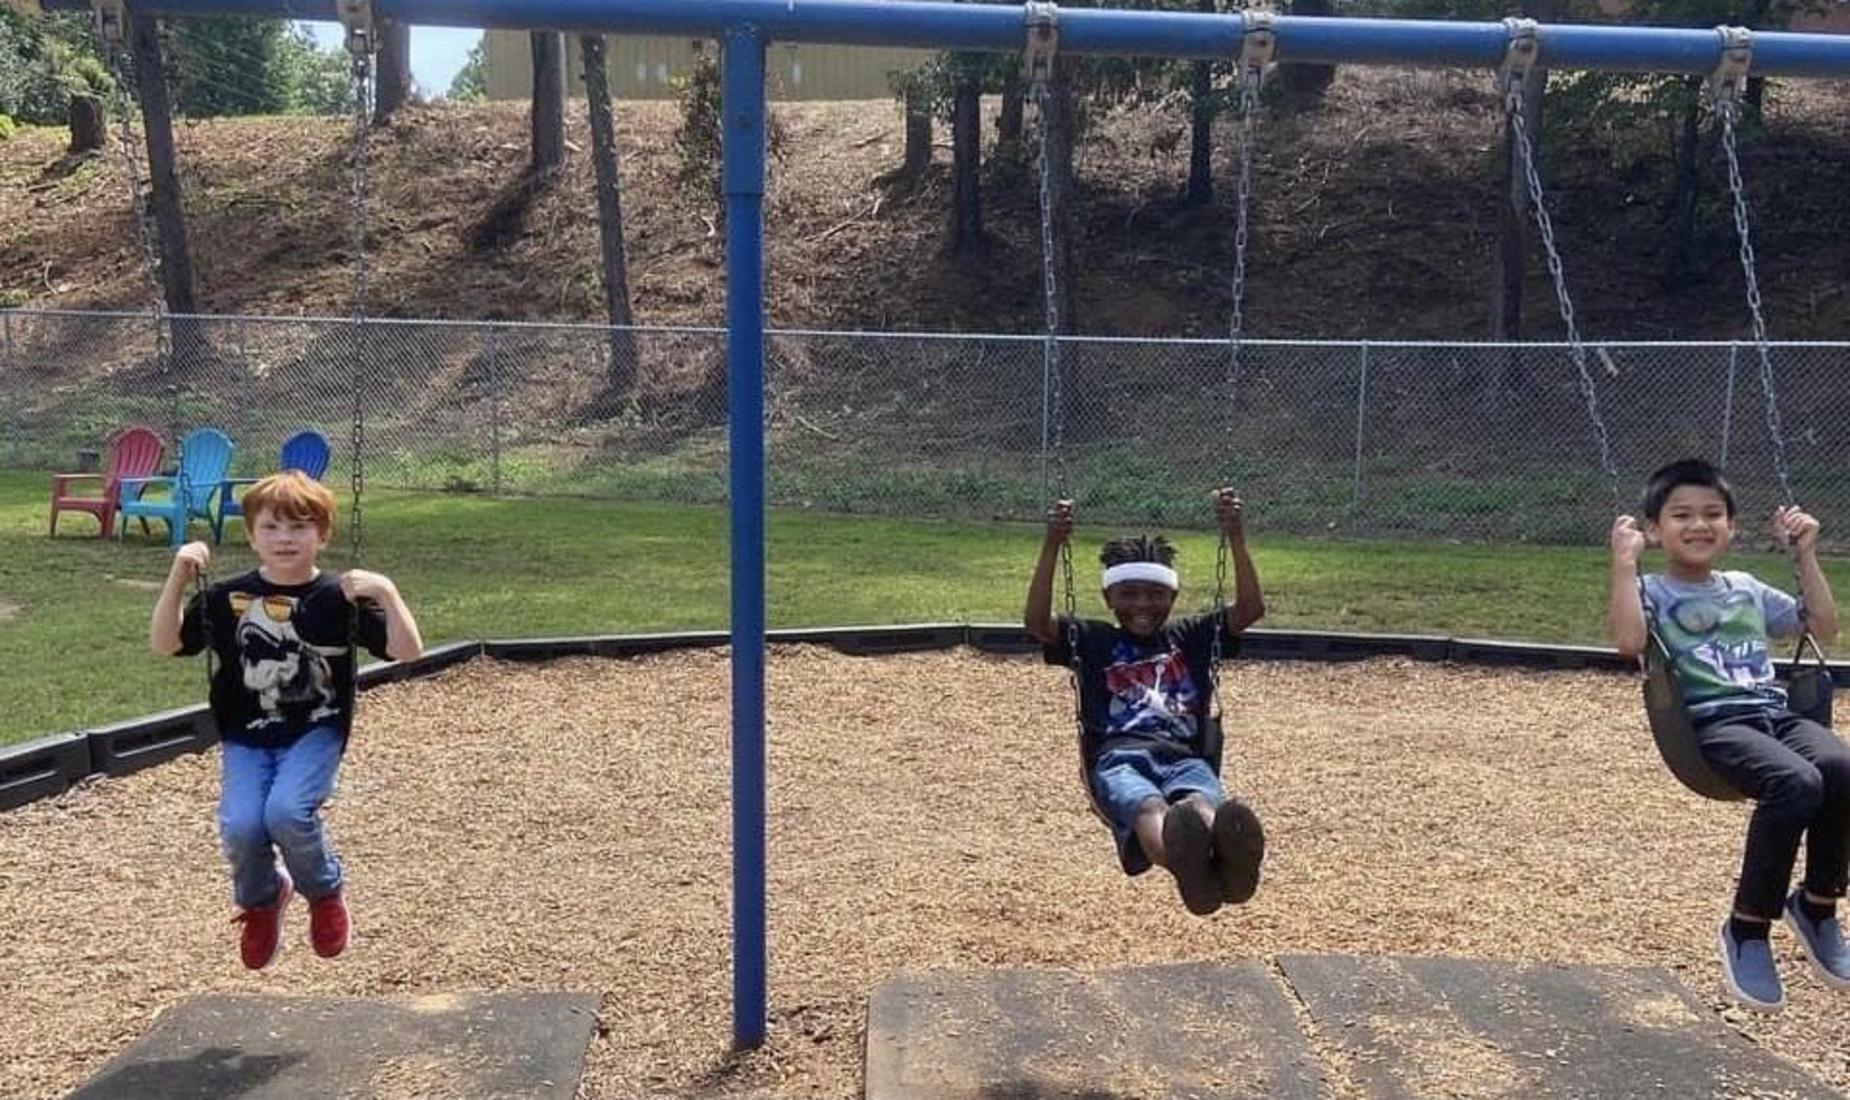 3 kids swinging